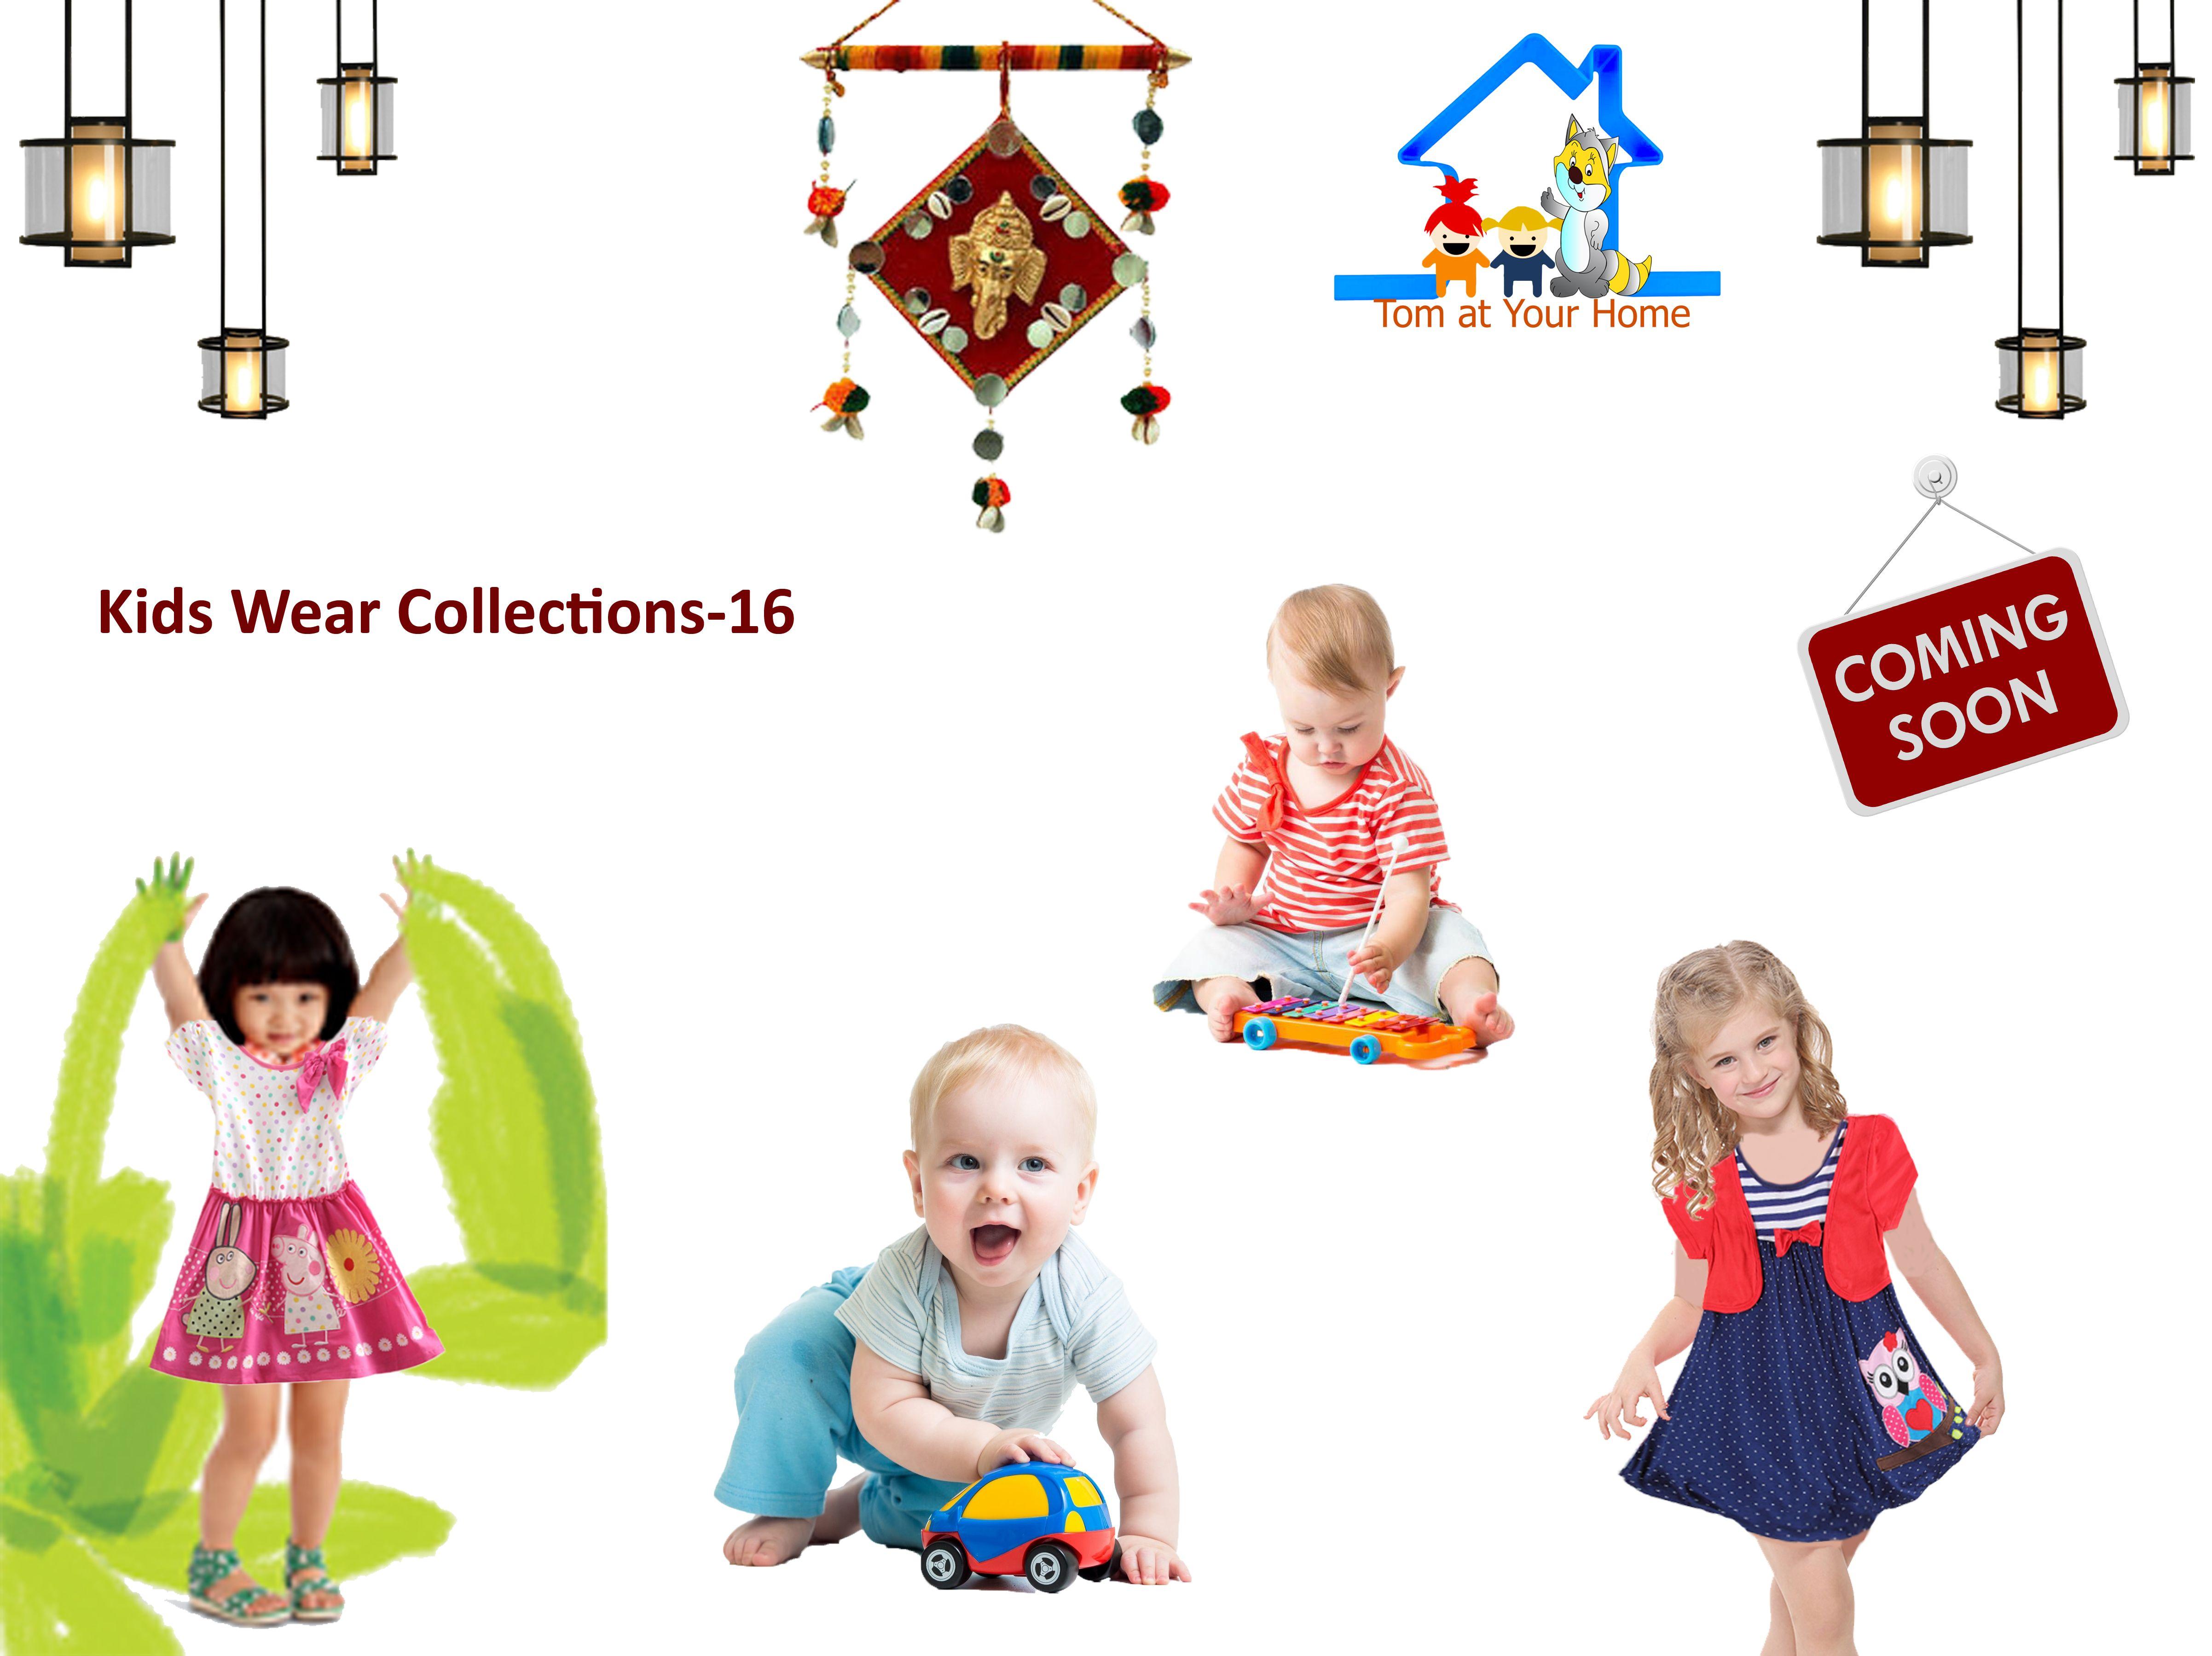 #tomatyourhome #newarrival #commingsoon #girlsfashion #kidswear #collection16 #dressesforgirls #happyshopping